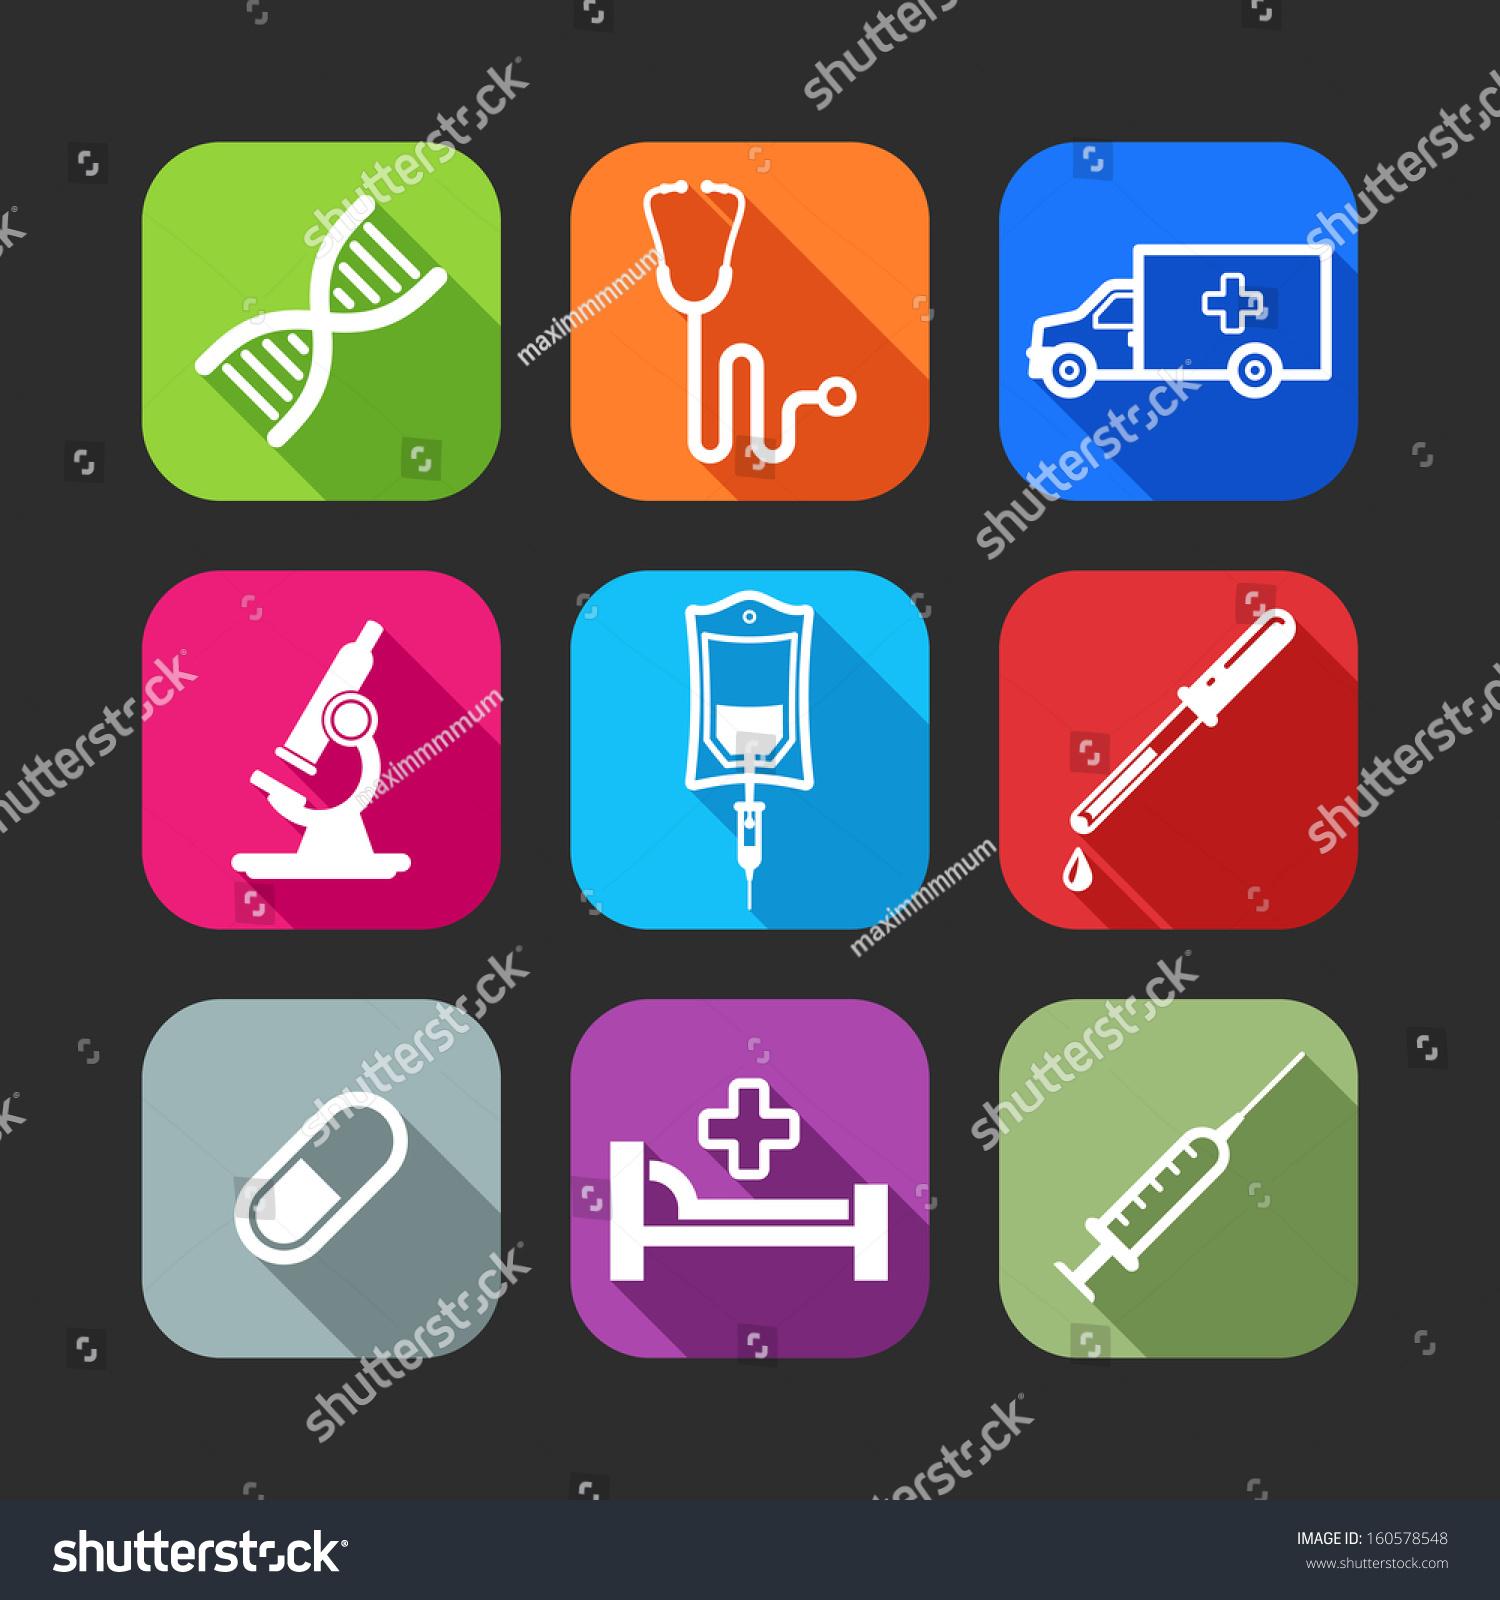 Medical Items Royalty Free Stock Photos - Image: 20799088